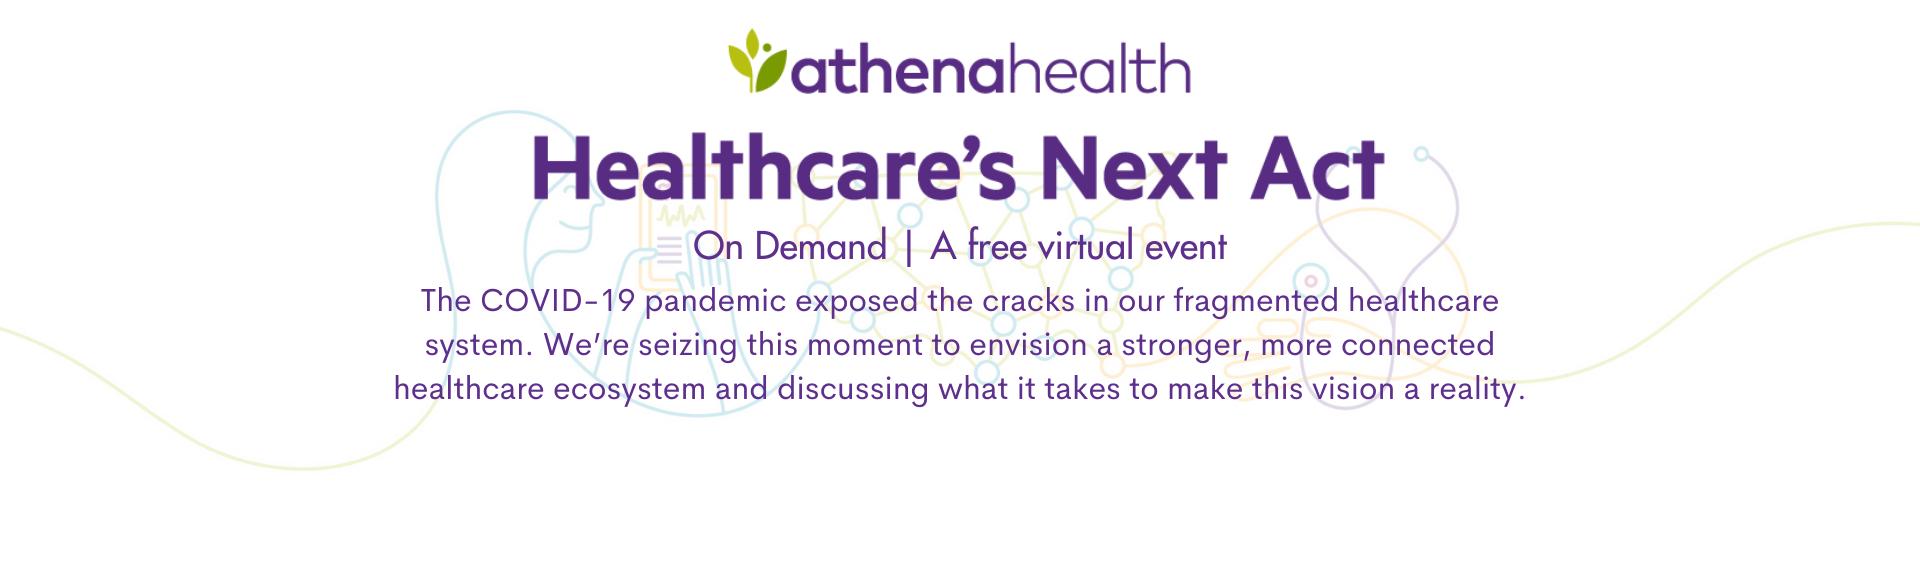 Healthcare's Next Act On Demand